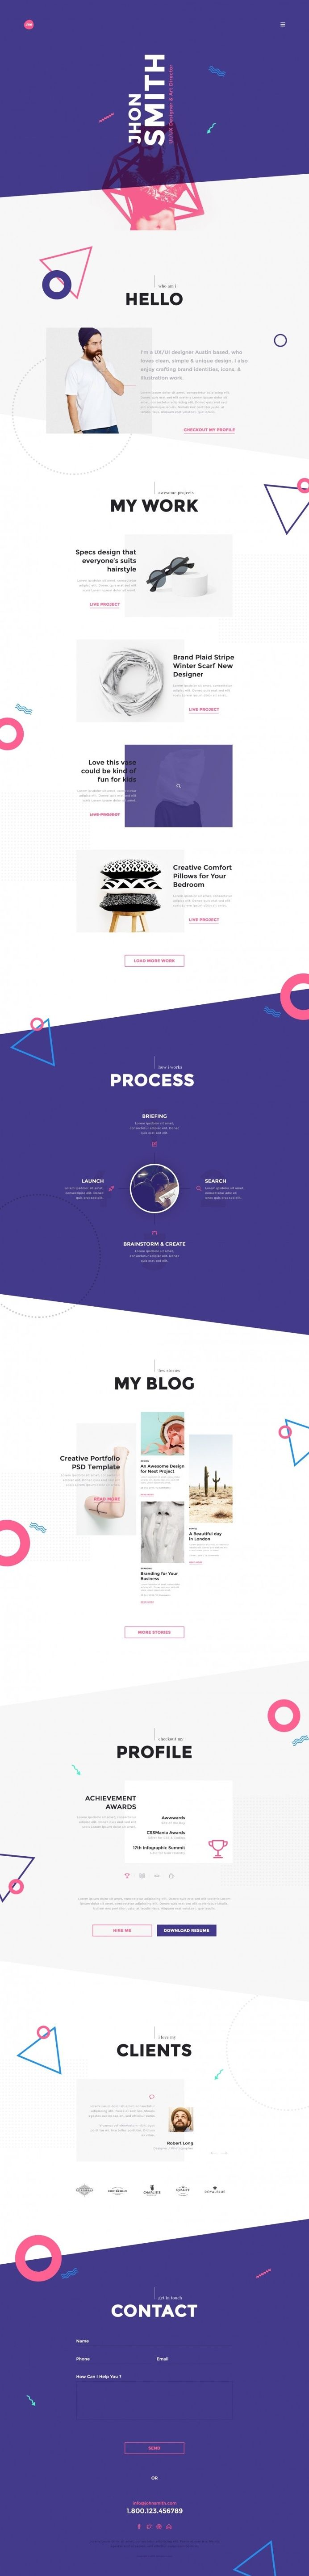 Me Creative Portfolio Resume Cv In Web Design Web Design